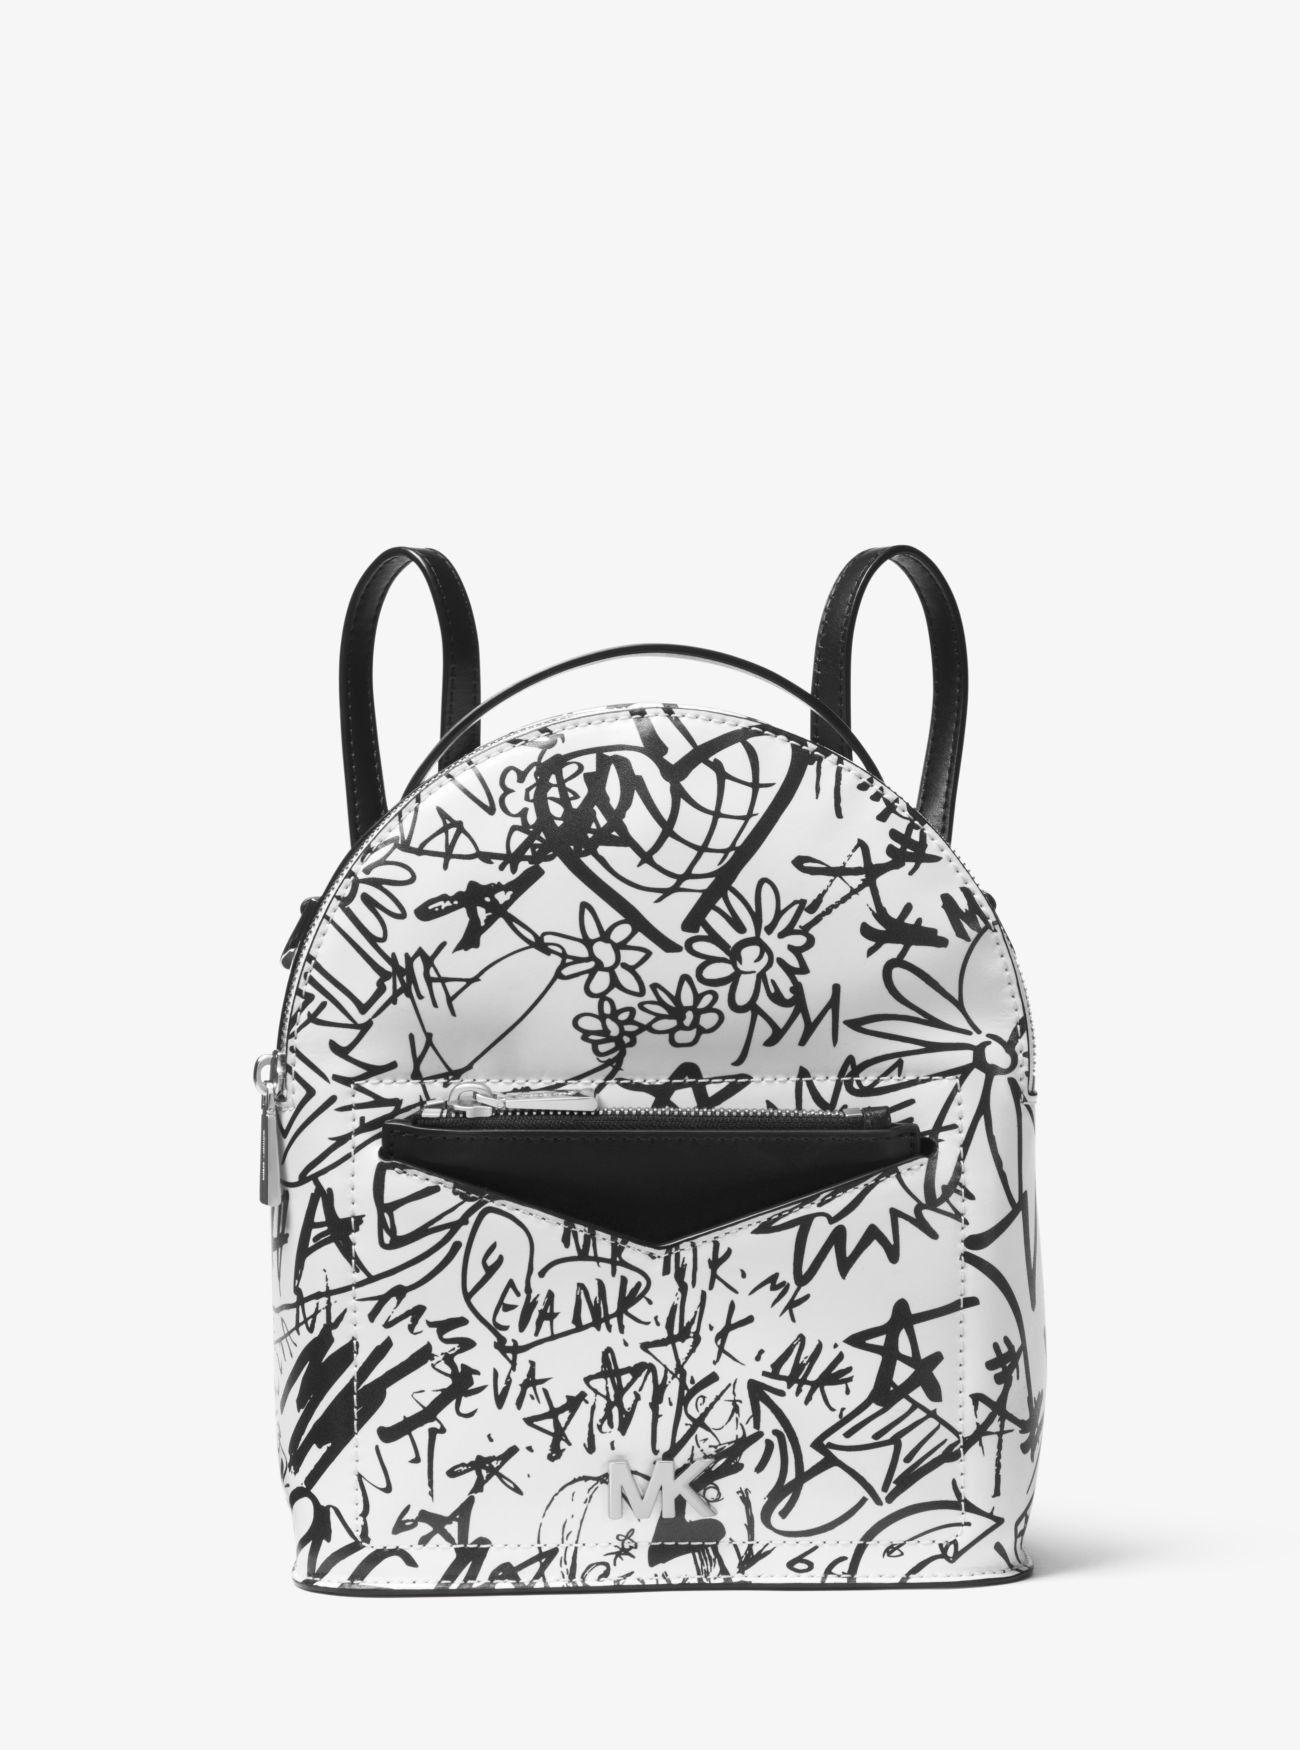 9691c388b9 Michael Kors Jessa Small Graffiti Leather Convertible Backpack - Optic White